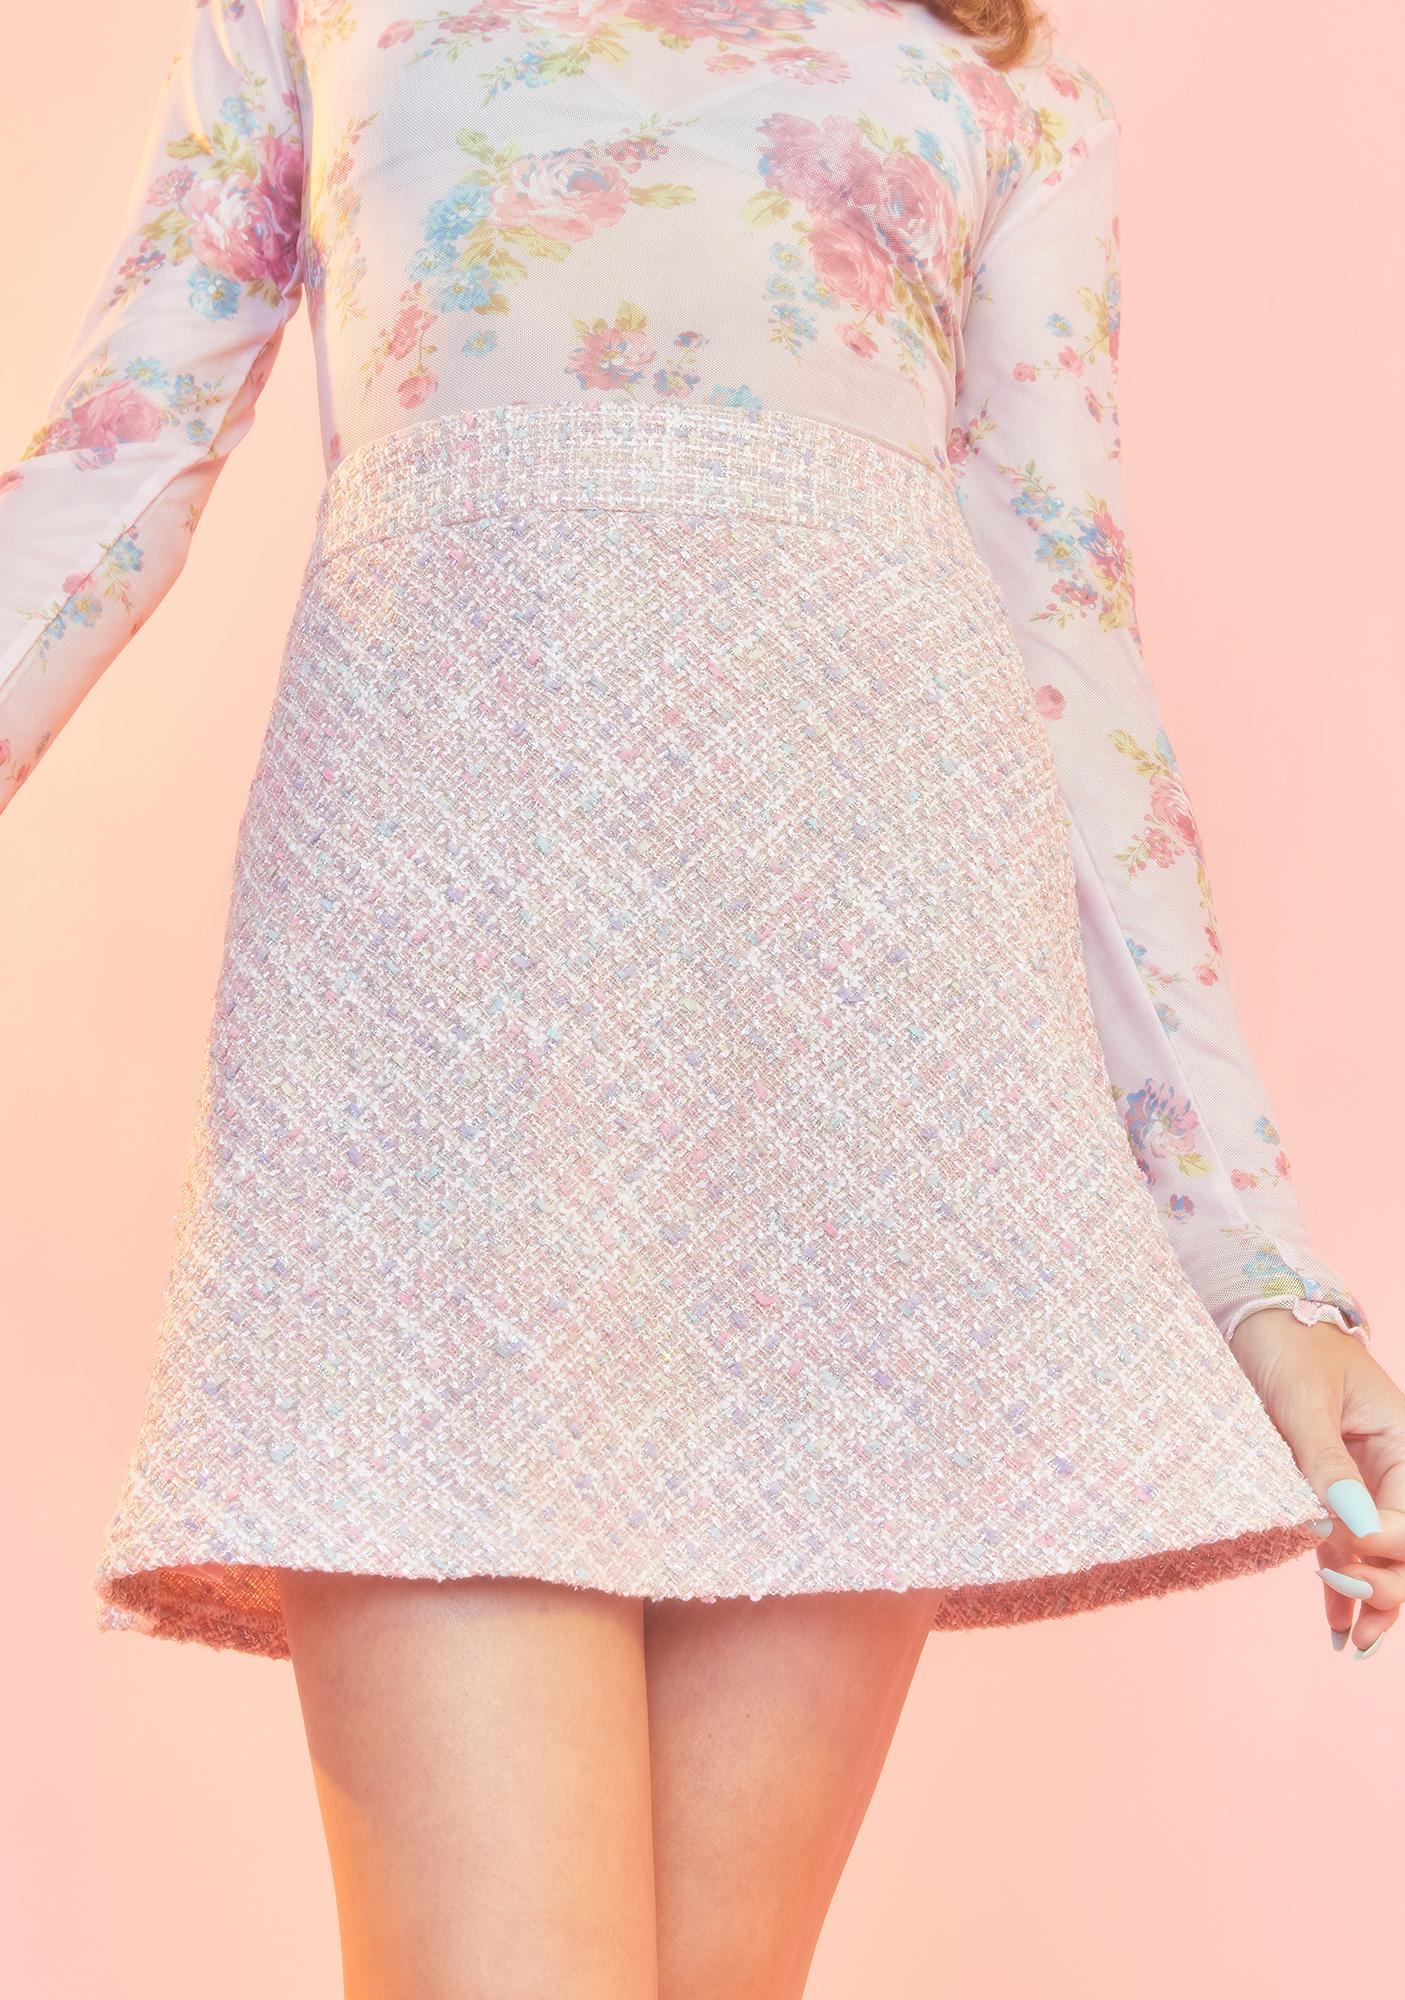 Sugar Thrillz Baby We're Going Shopping Mini Skirt